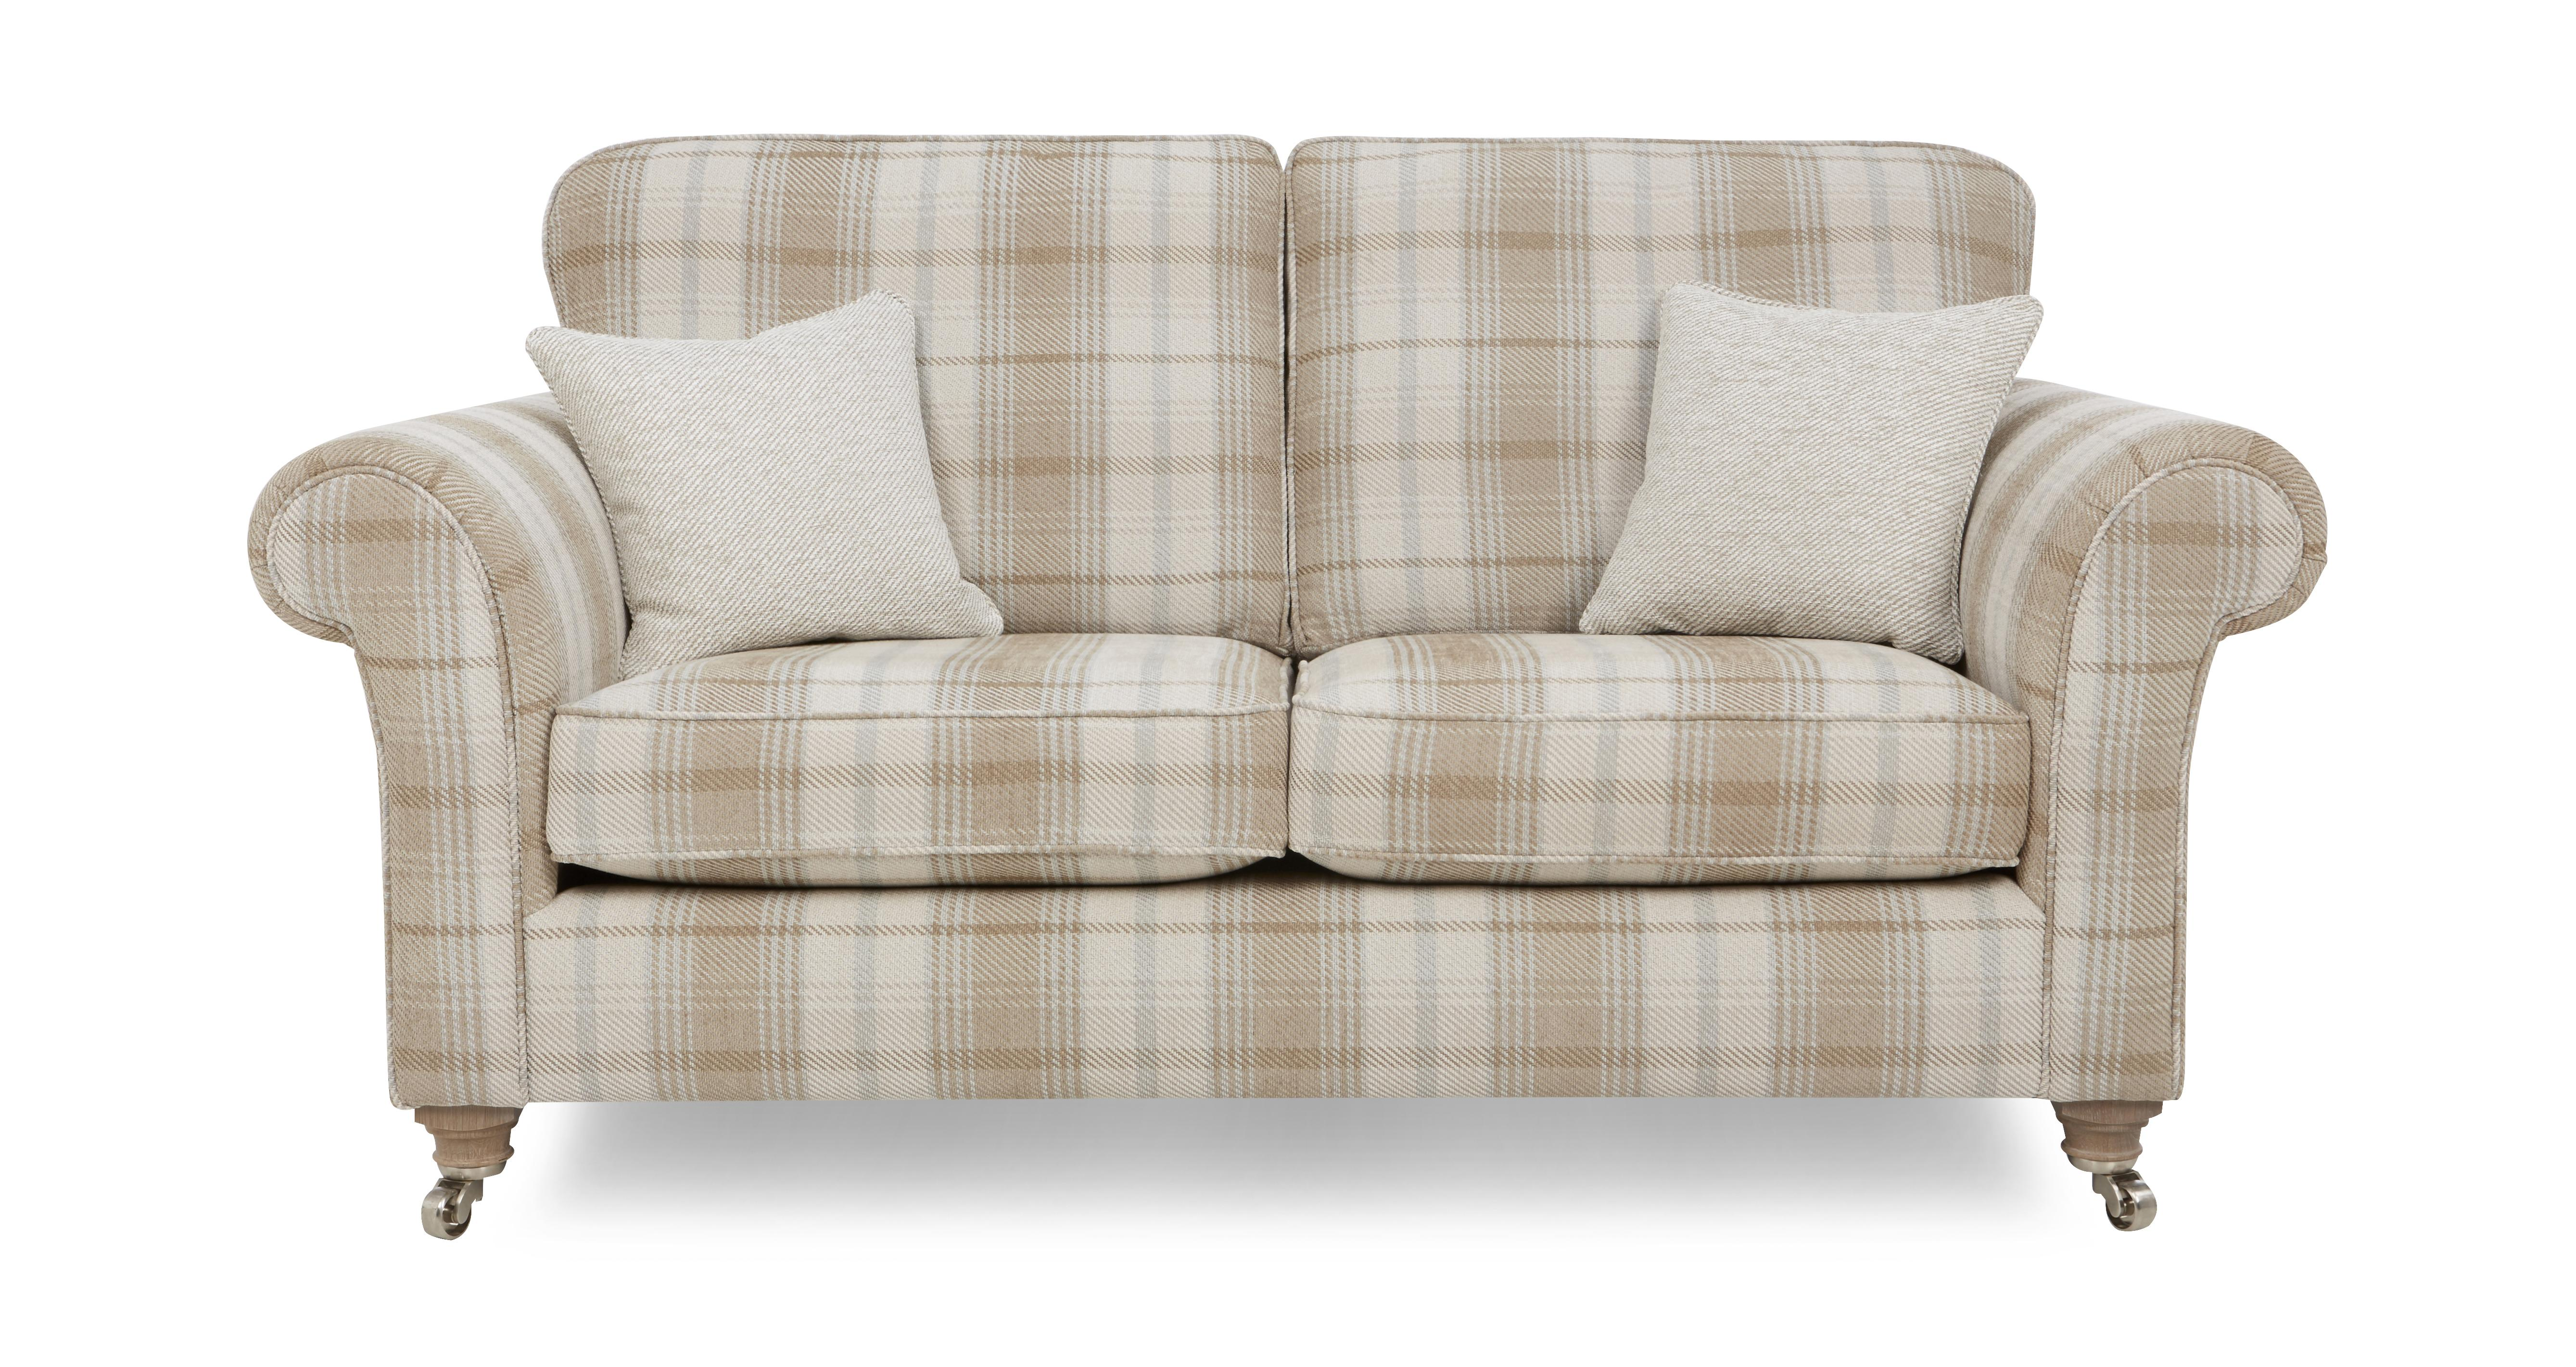 Morland Plaid 2 Seater Formal Back Sofa